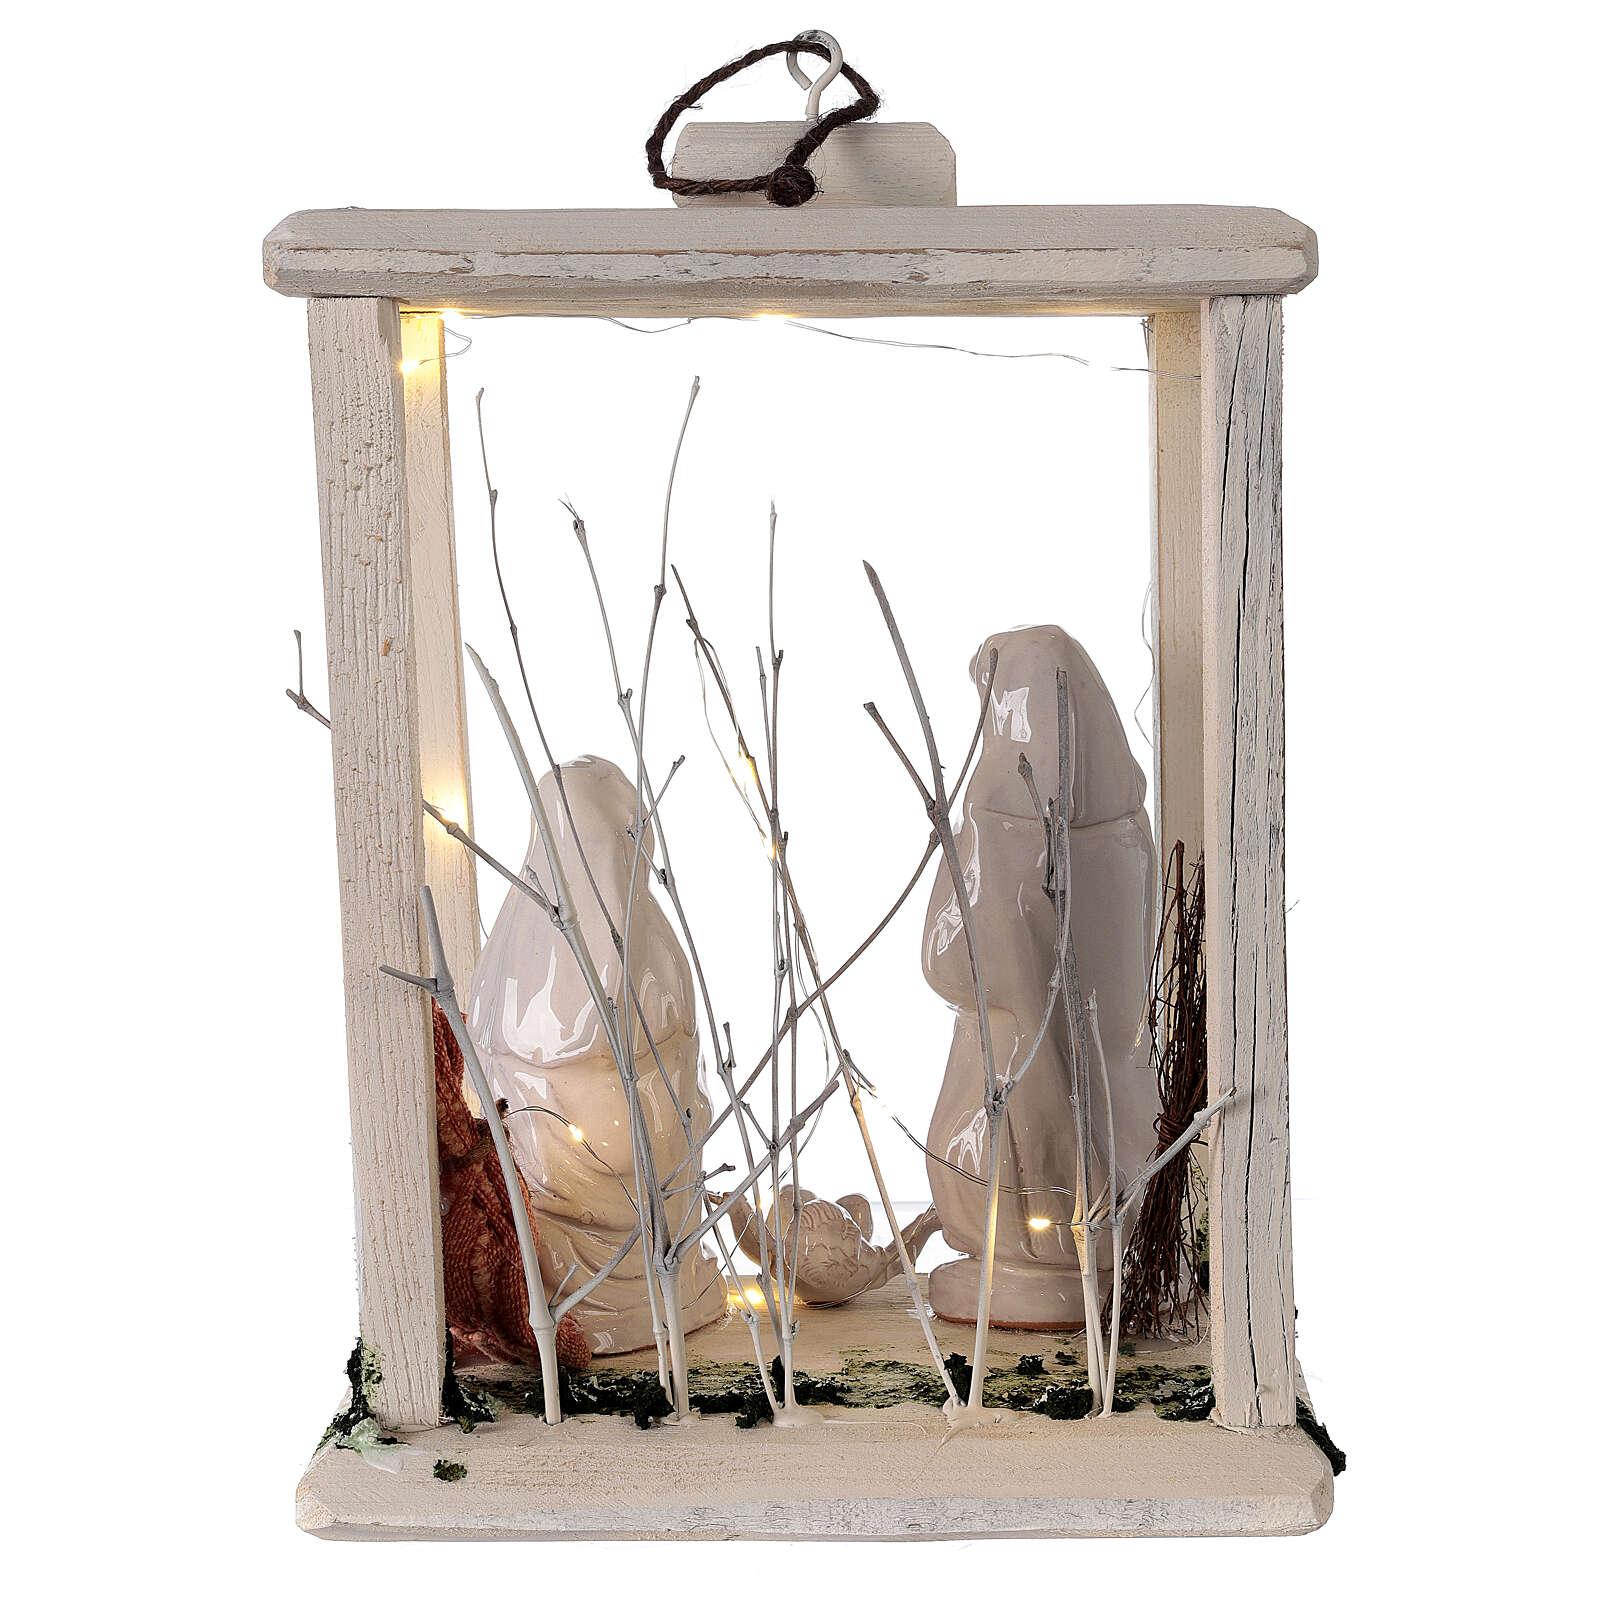 Lanterna legno Natività 20 cm terracotta bianca Deruta 20 led 35x26x20 cm 4